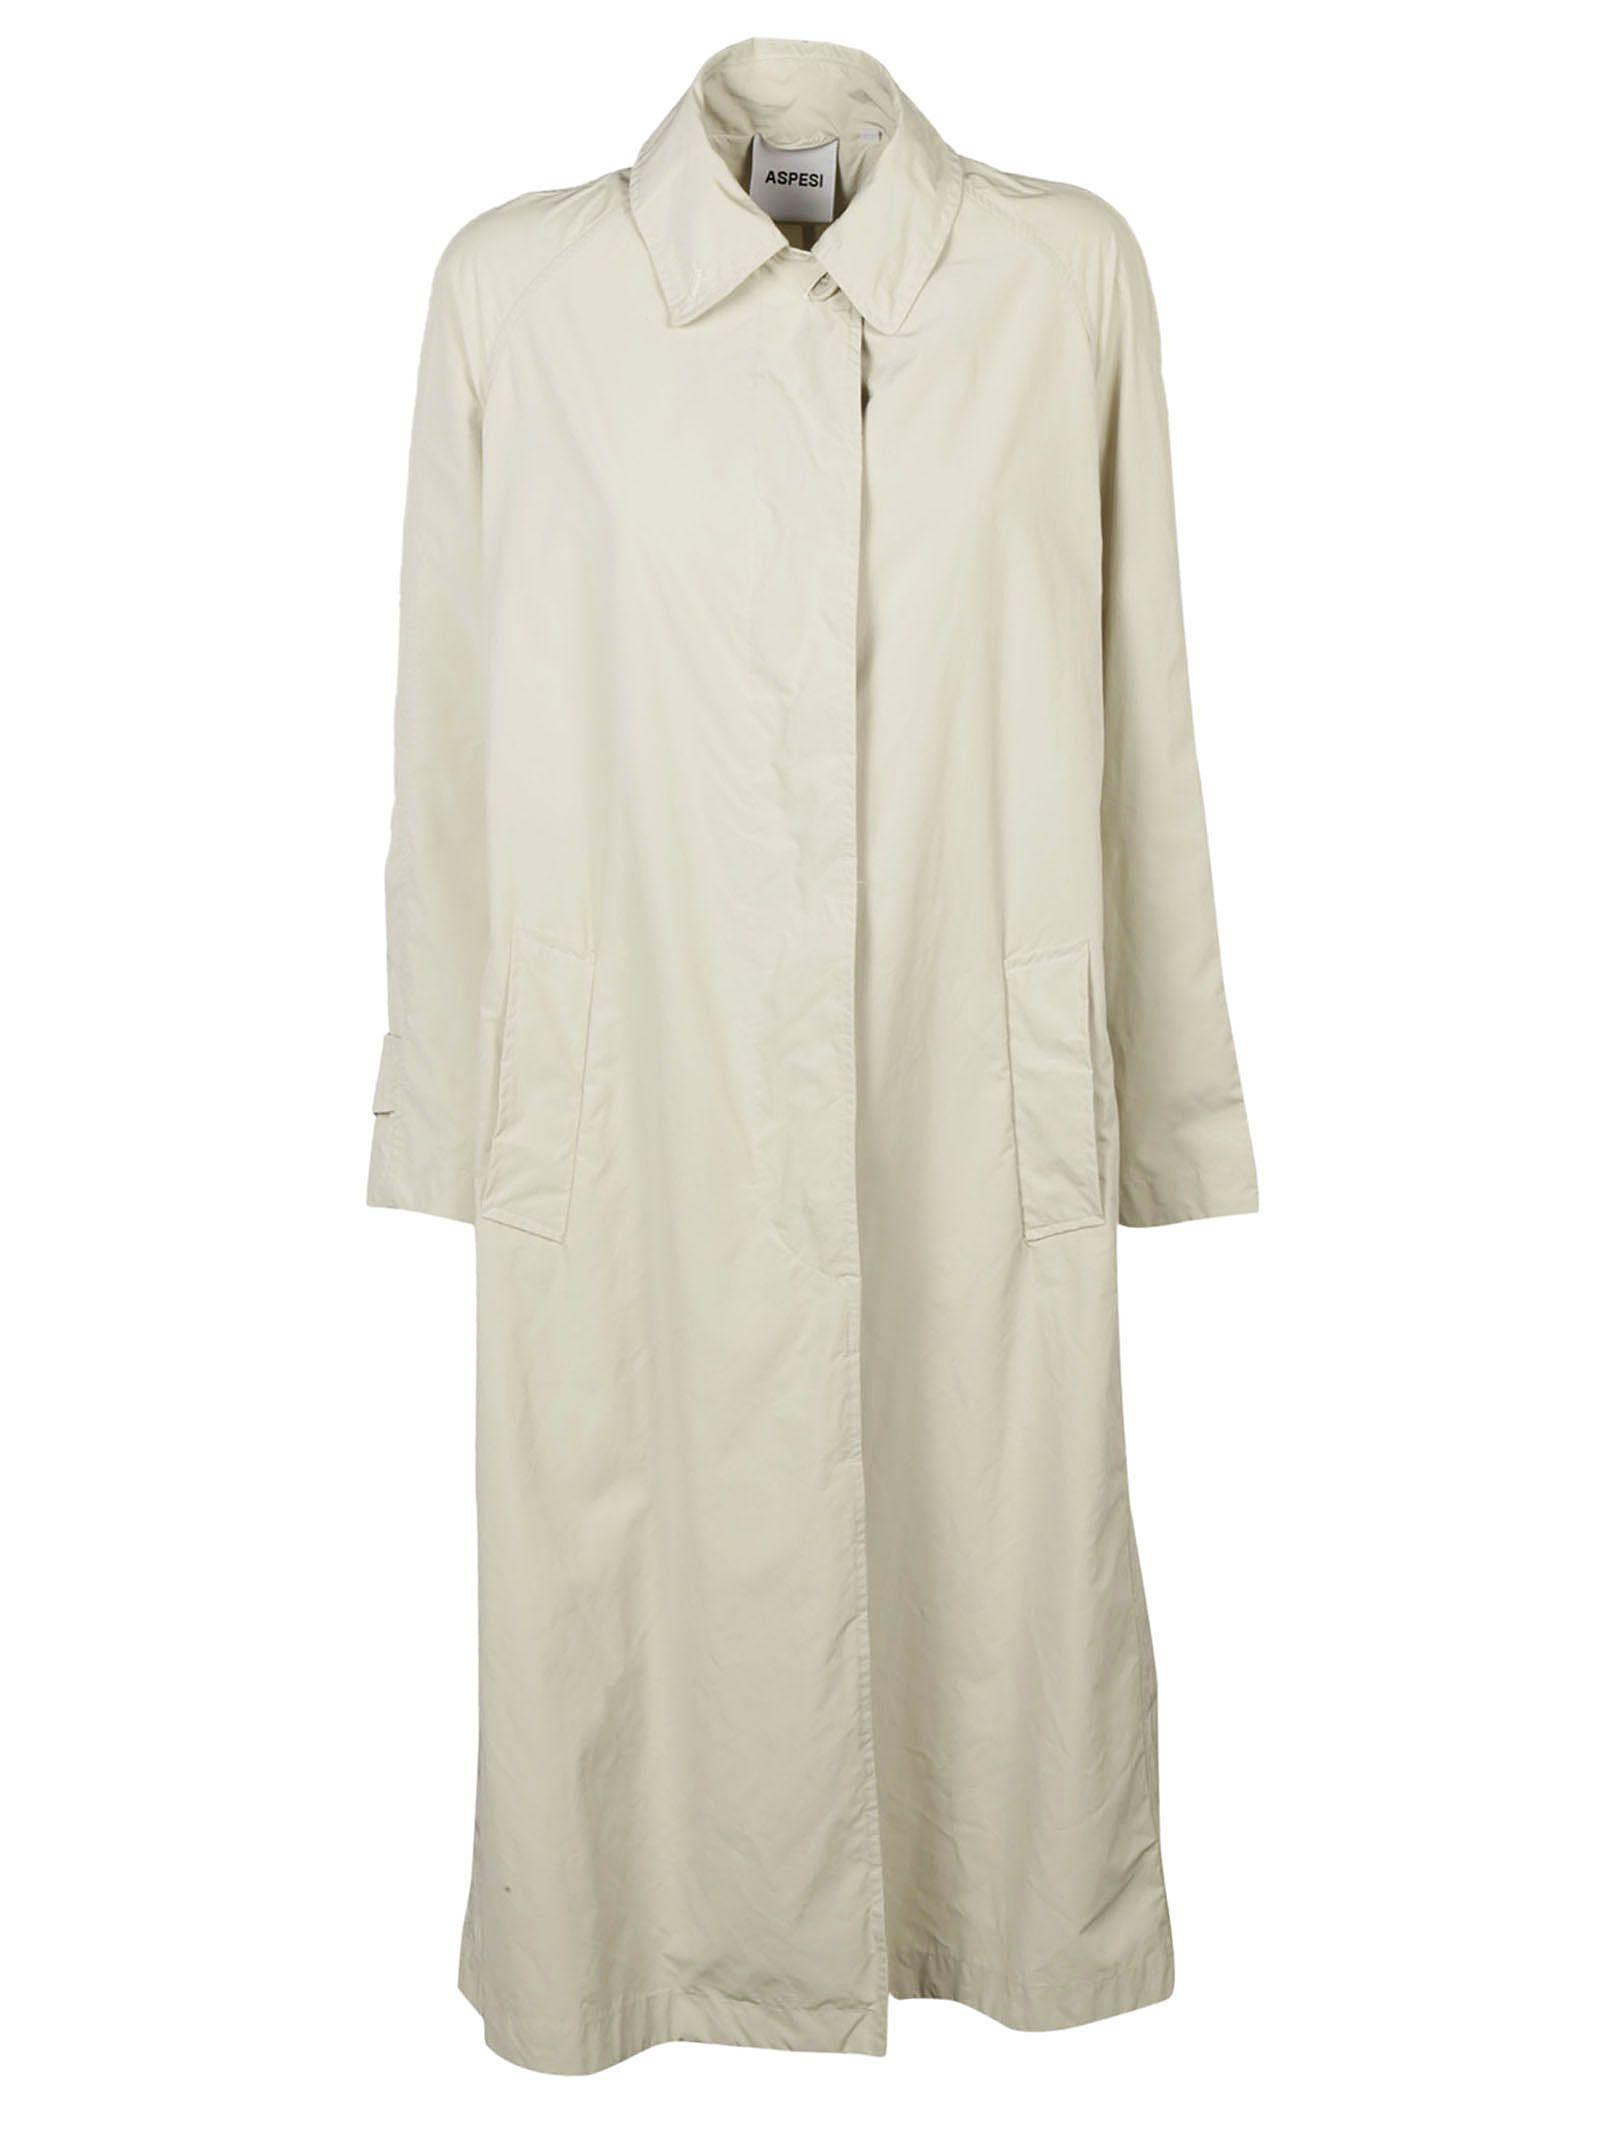 Aspesi Collared Coat